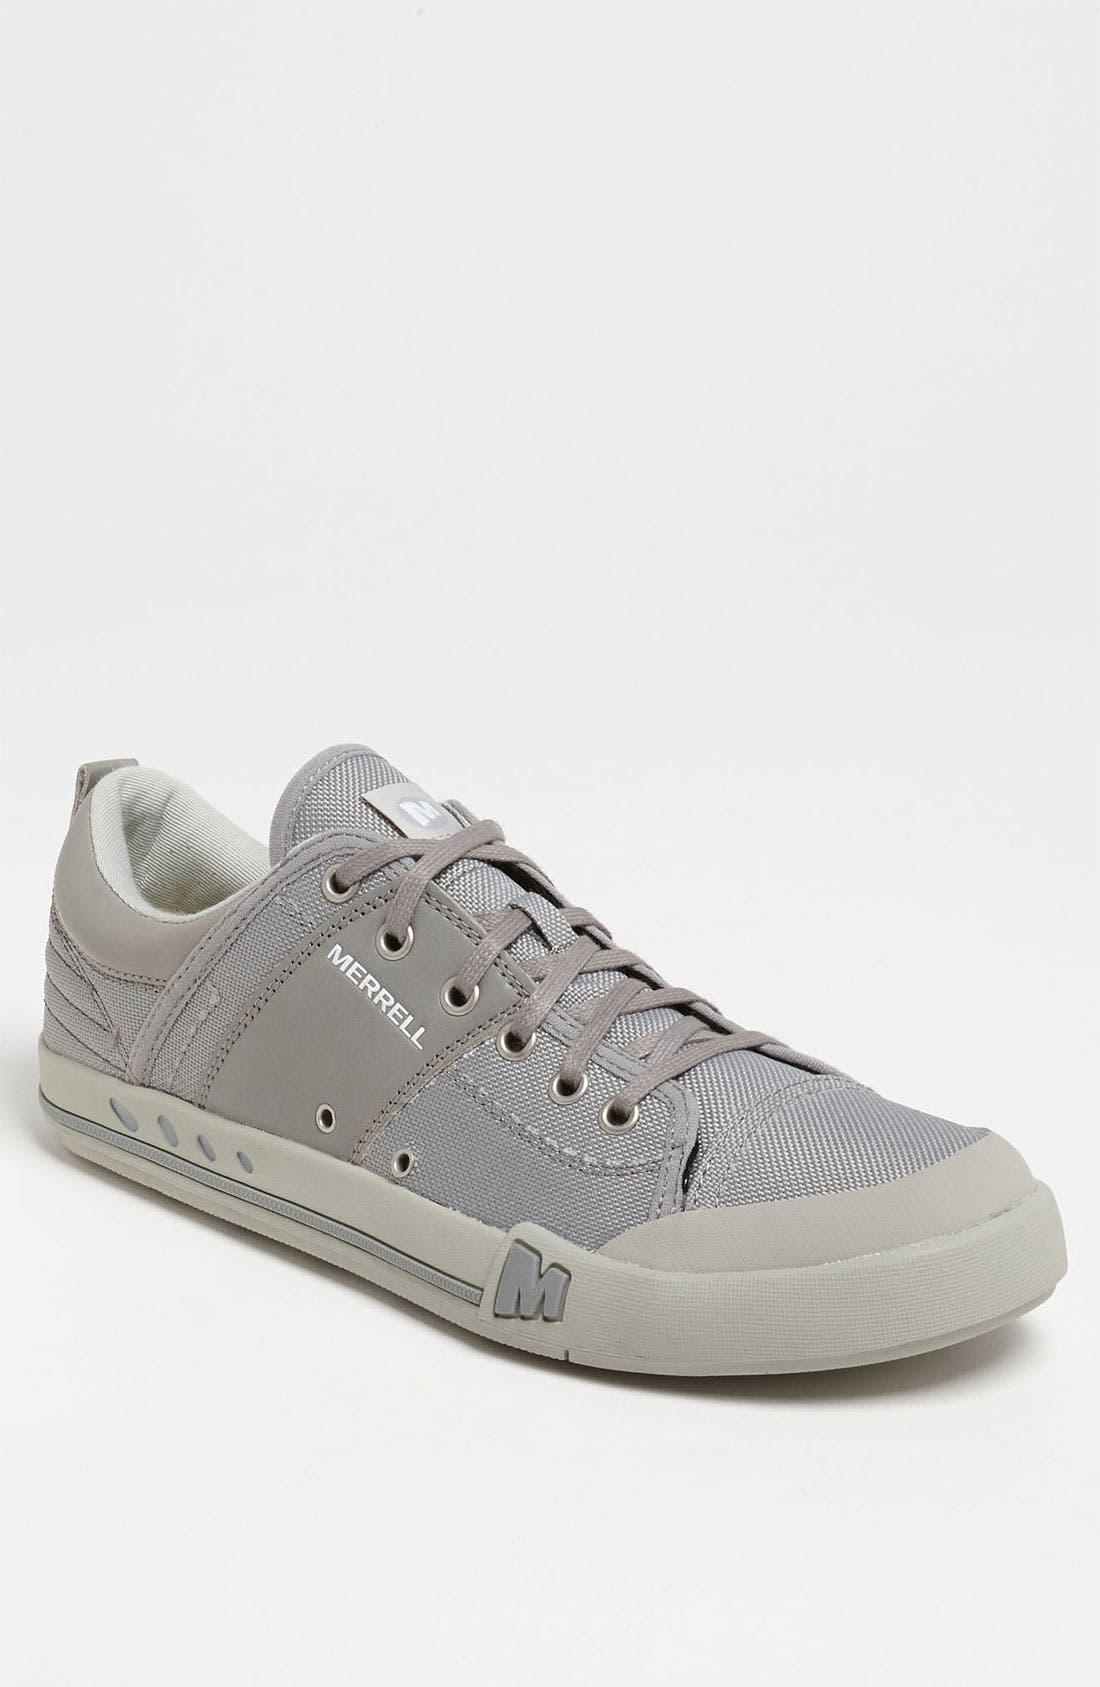 Main Image - Merrell 'Rant' Sneaker